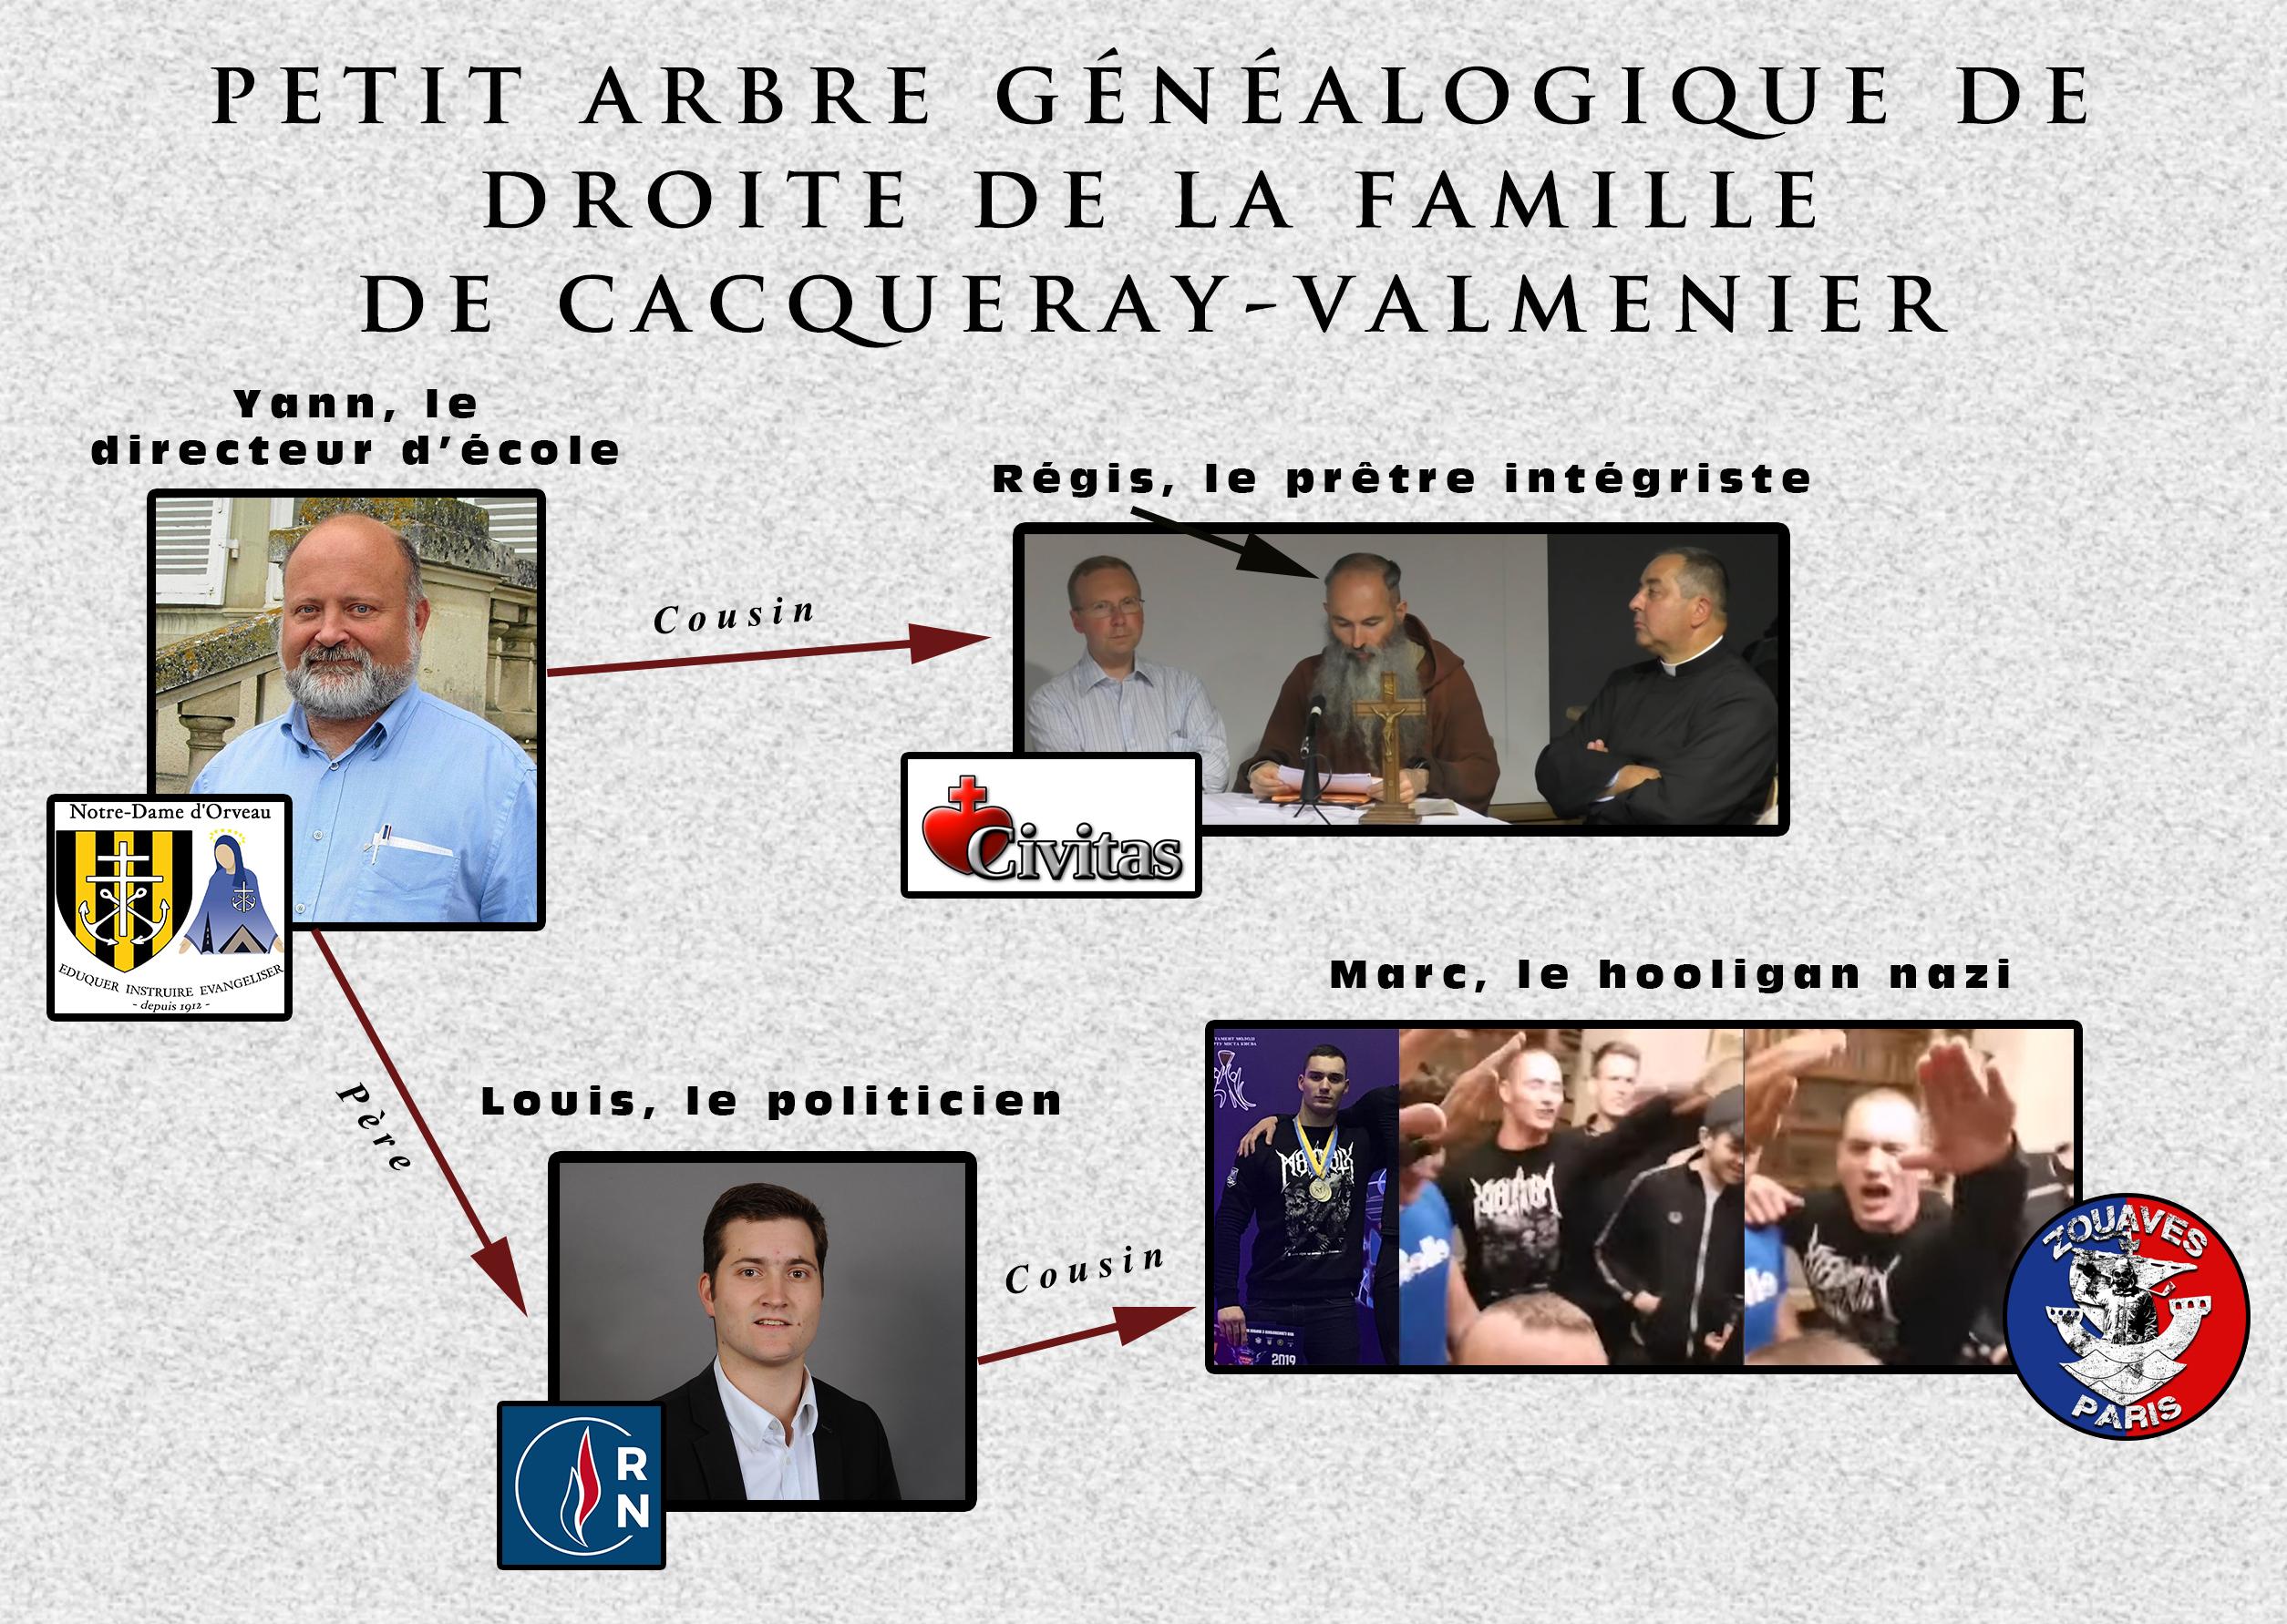 Cacqueray-Valmenier